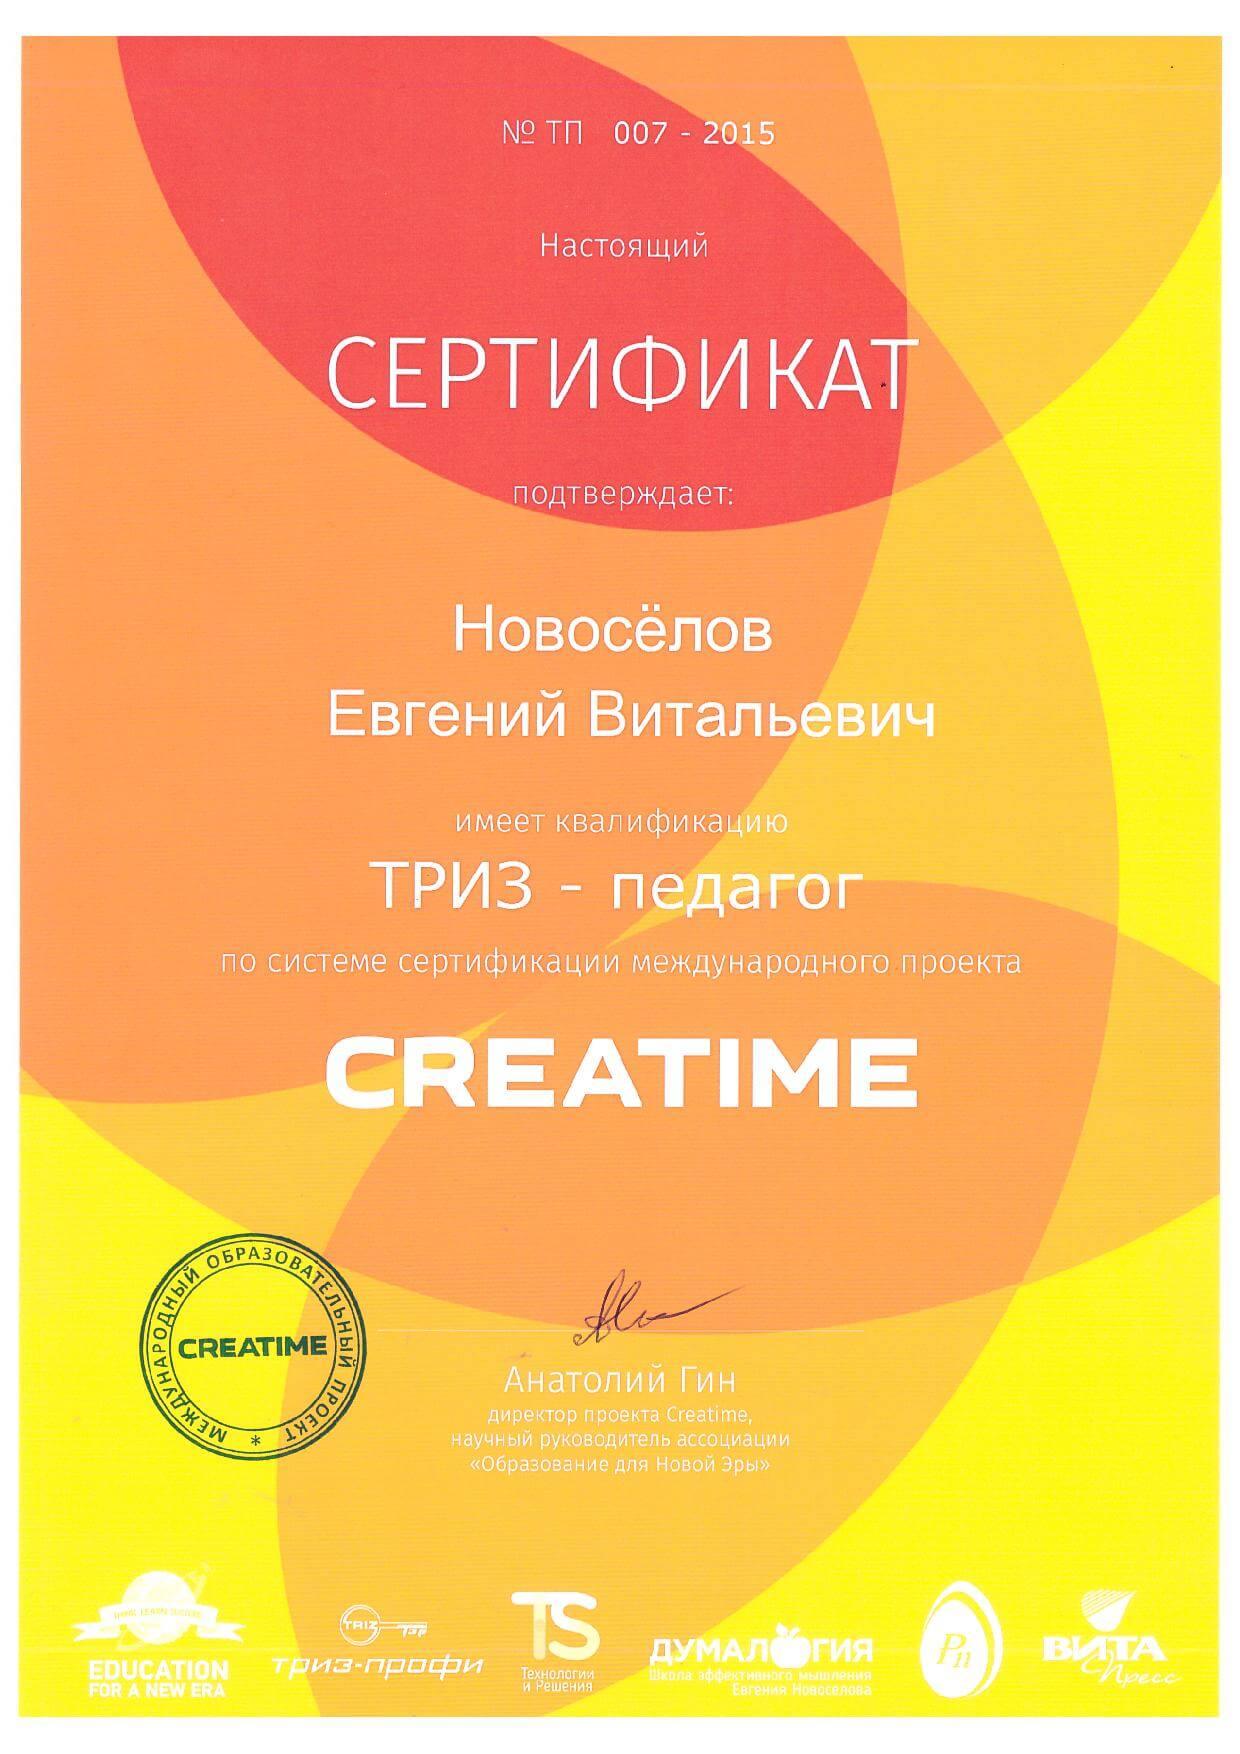 web_certificate_7